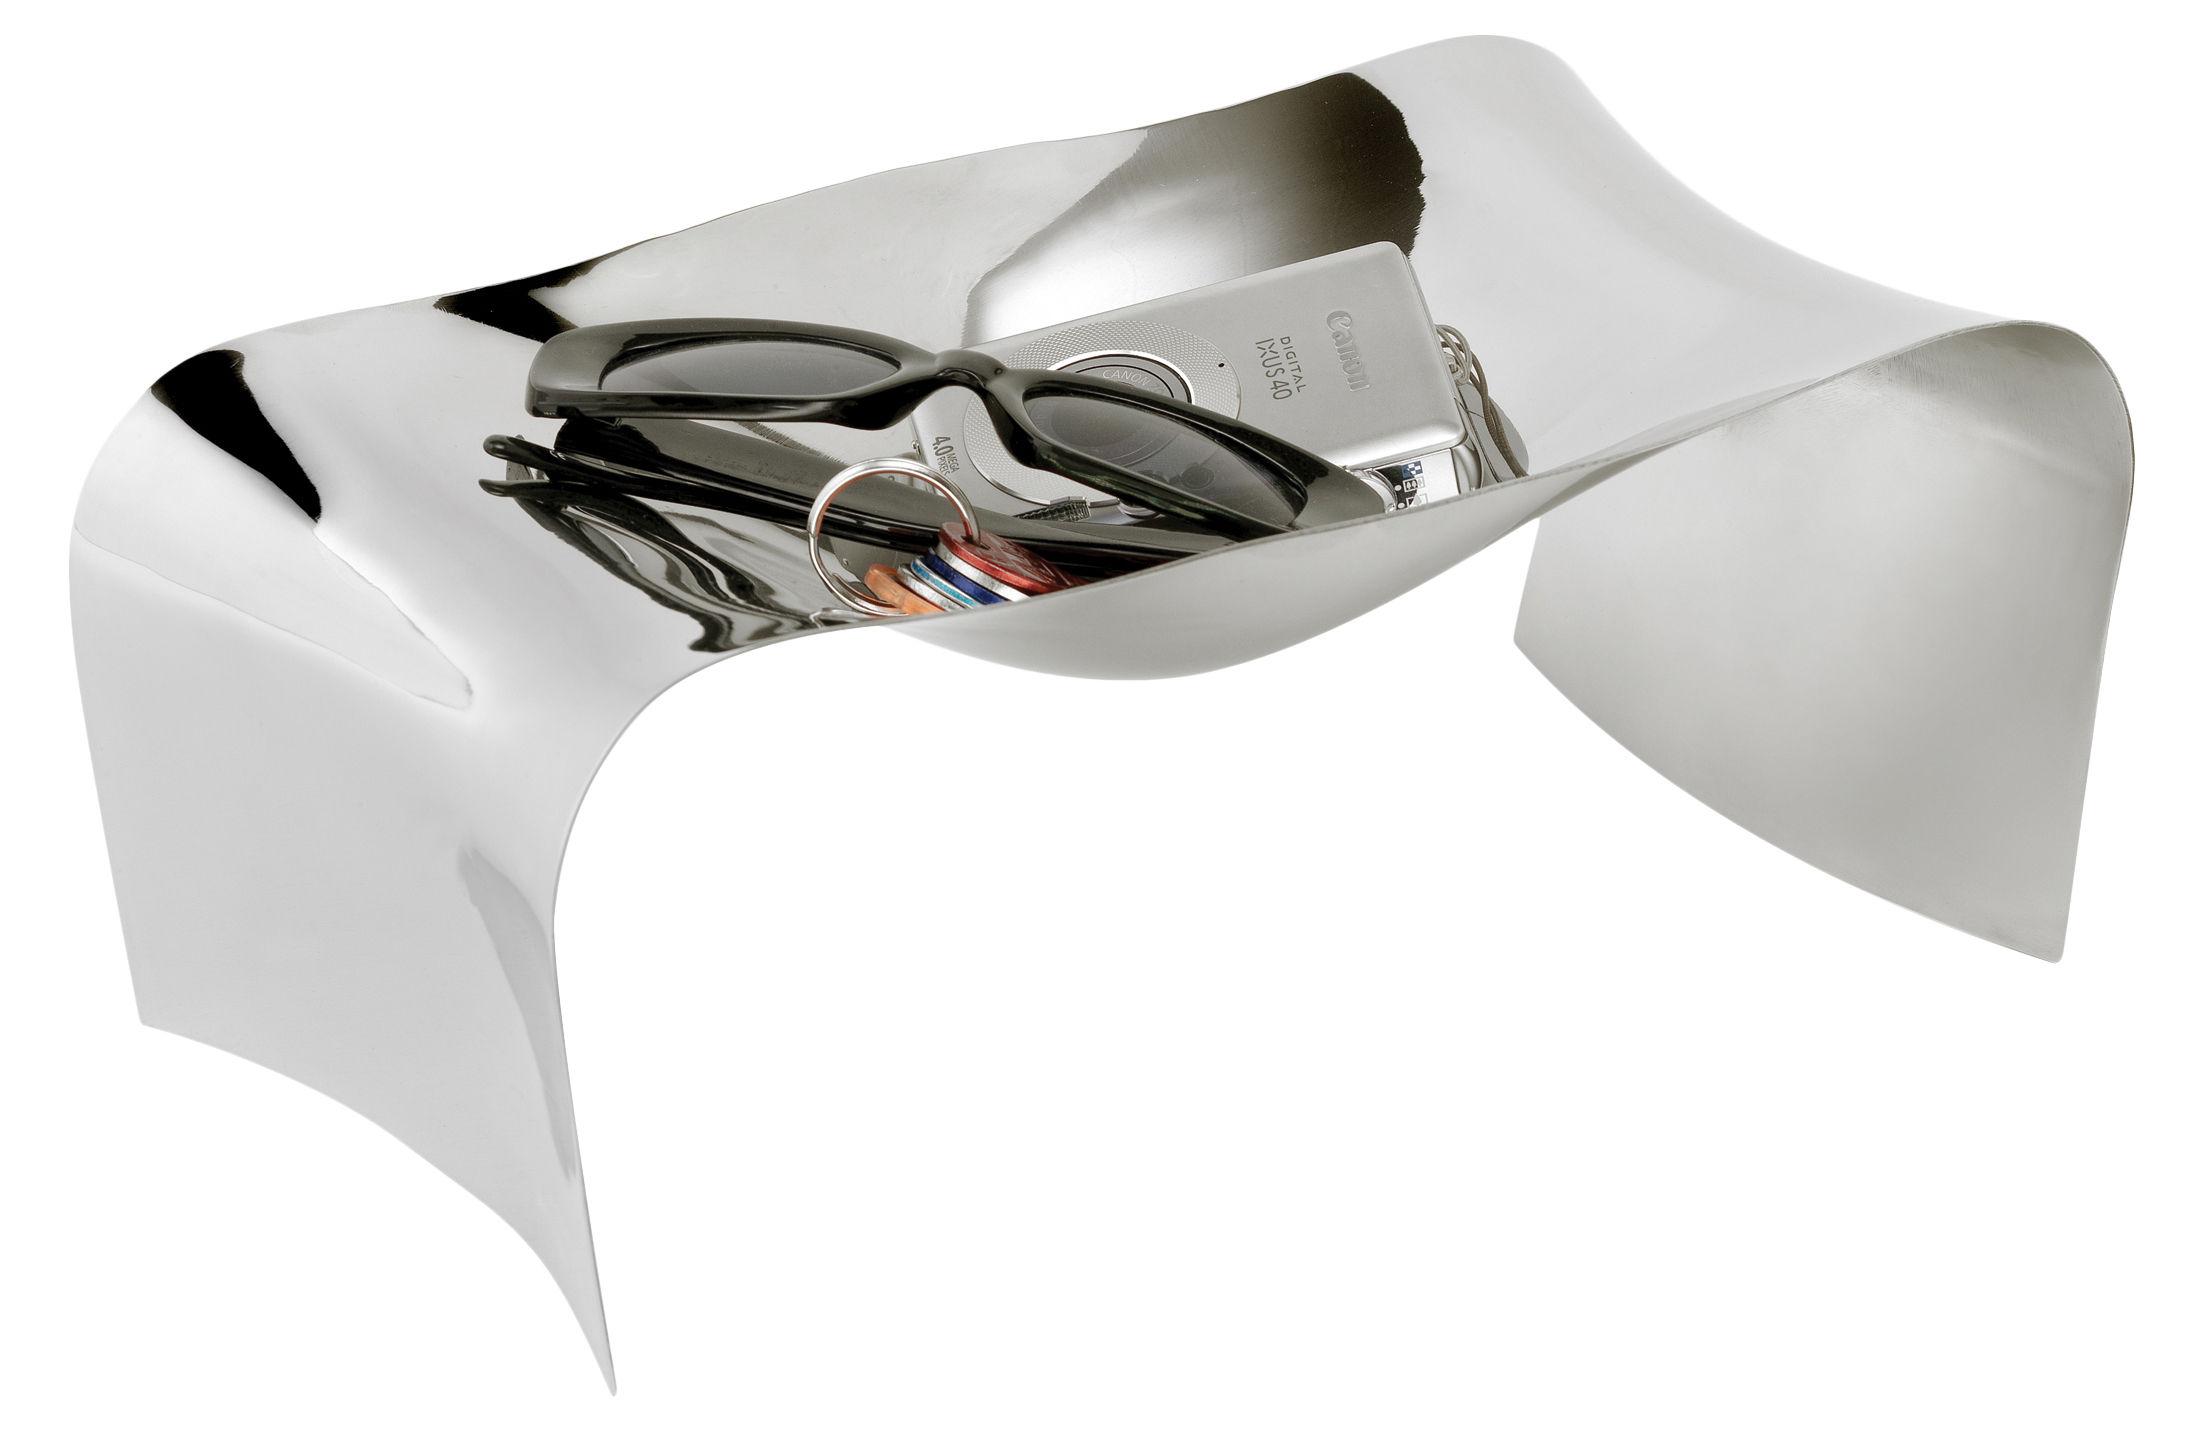 scopri svuotatasche scup acciaio di alessi made in. Black Bedroom Furniture Sets. Home Design Ideas